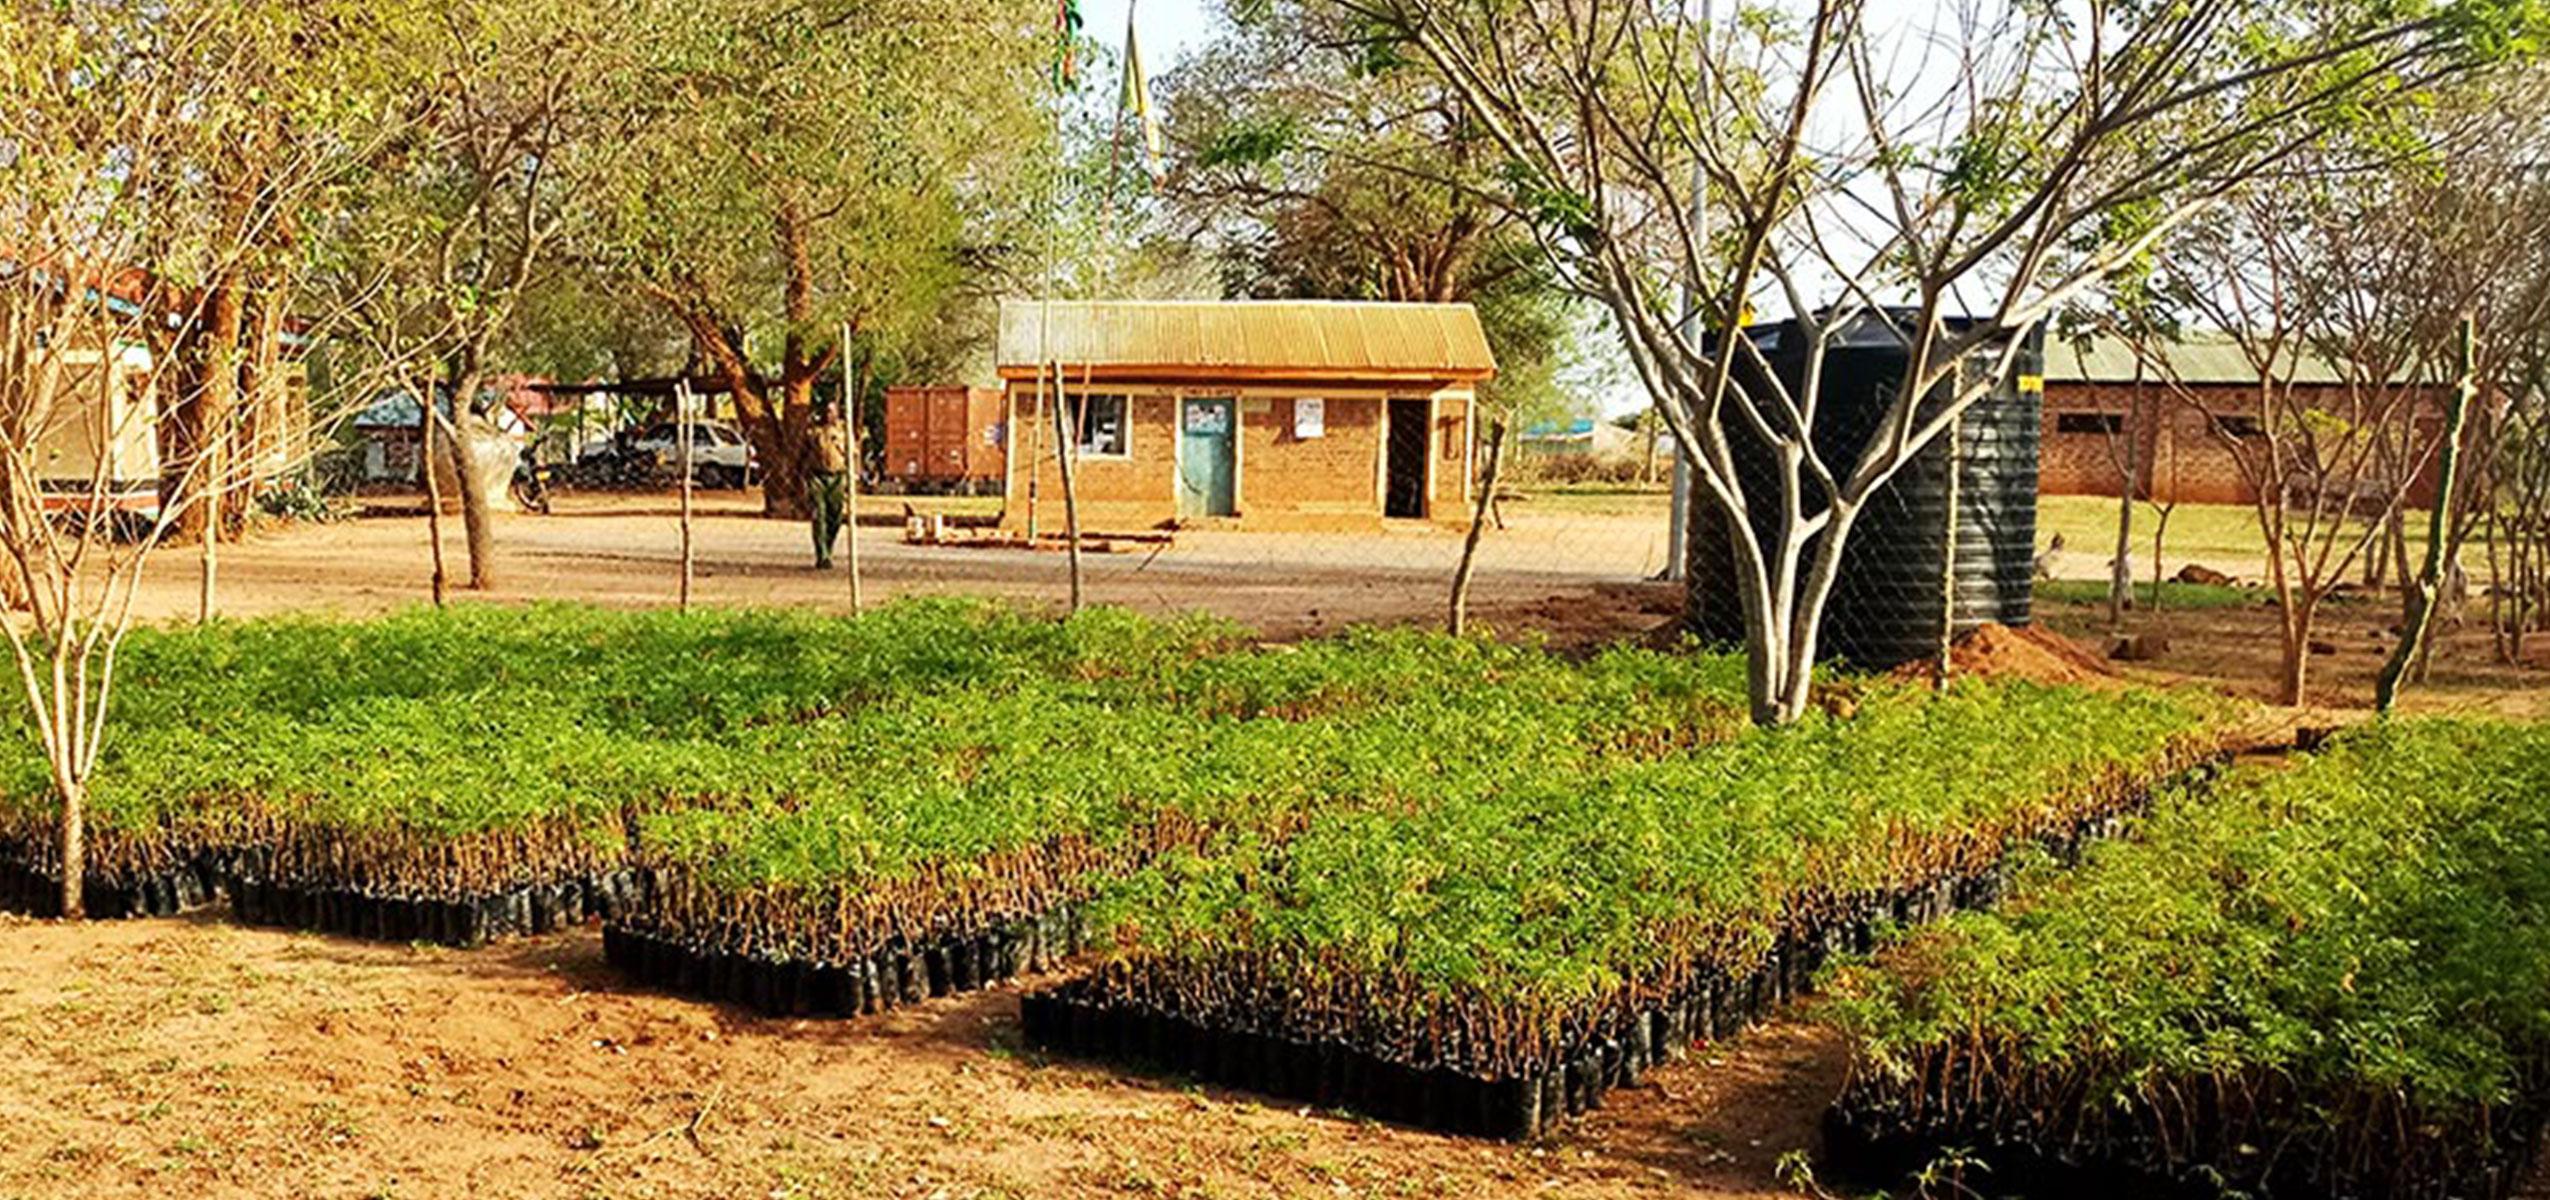 Regnperiod betyder nyplantering